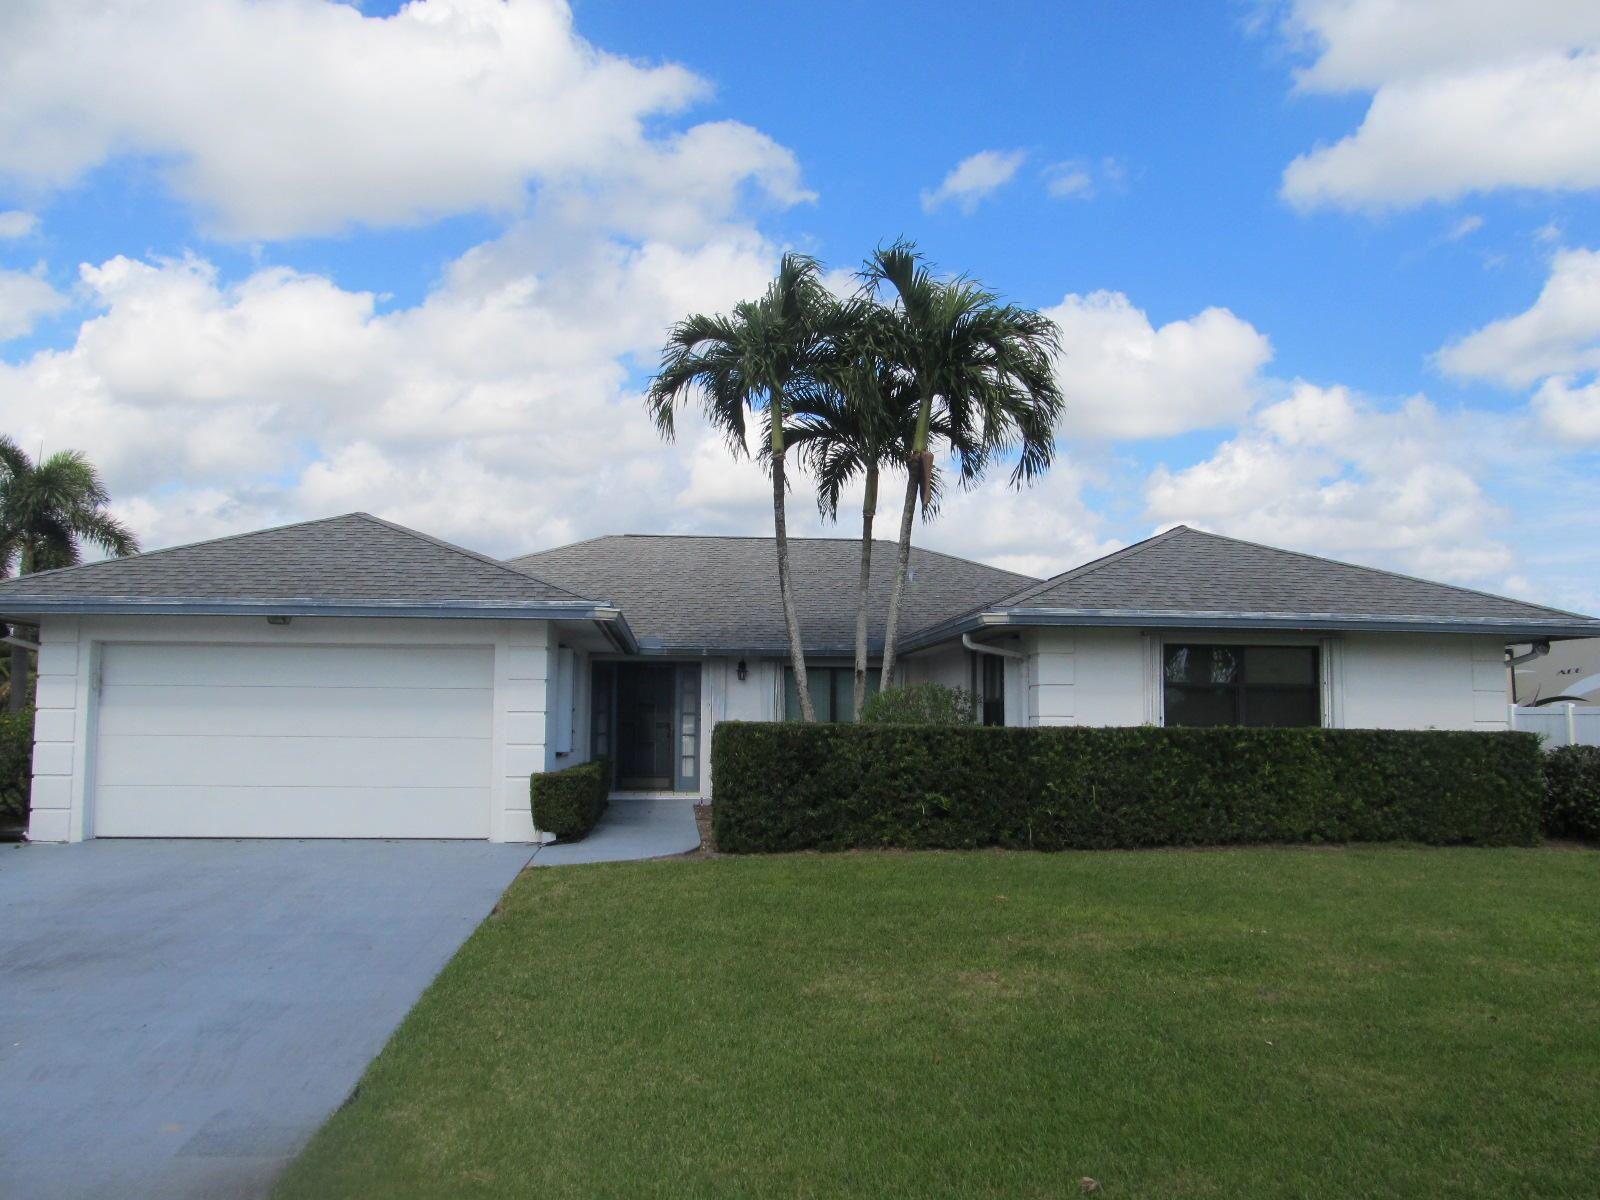 4111 Palo Verde Drive, Boynton Beach, FL 33436 - #: RX-10667258